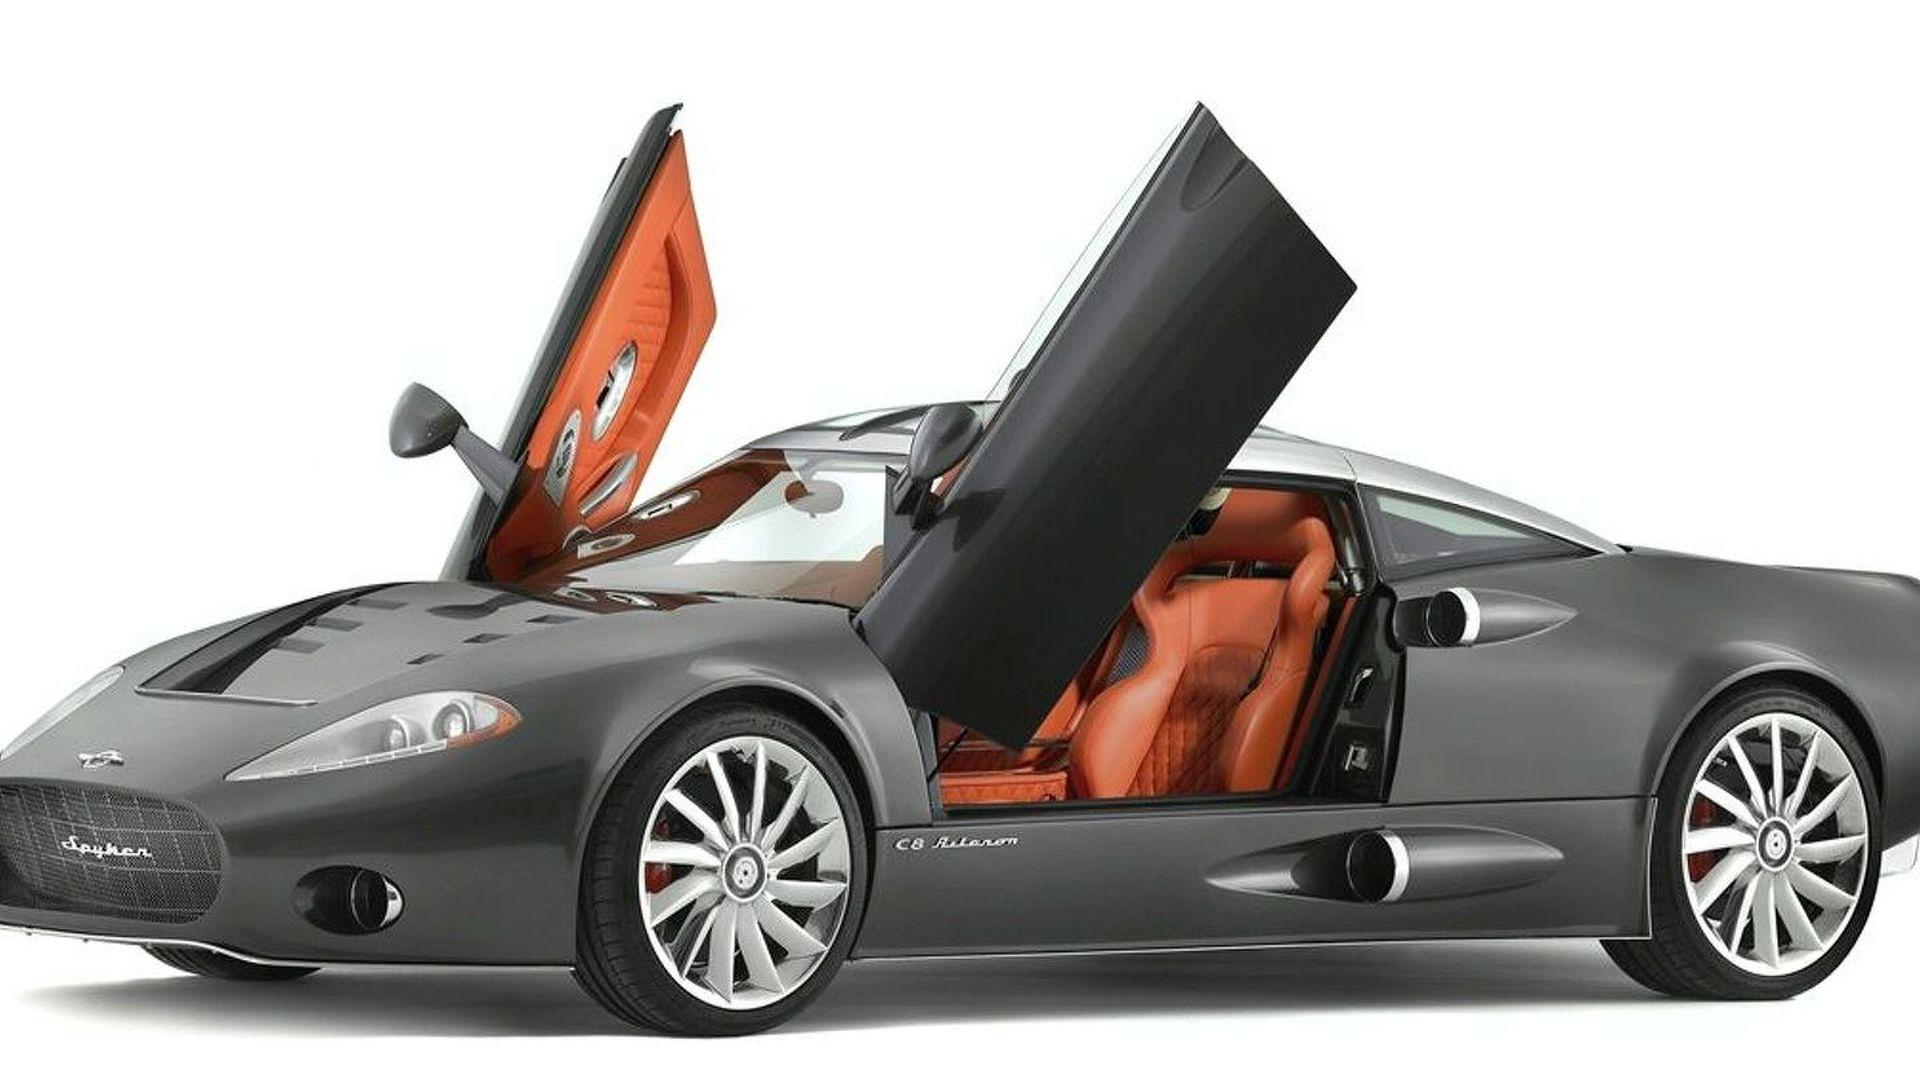 Spyker C8 Aileron to Make US Debut at Pebble Beach